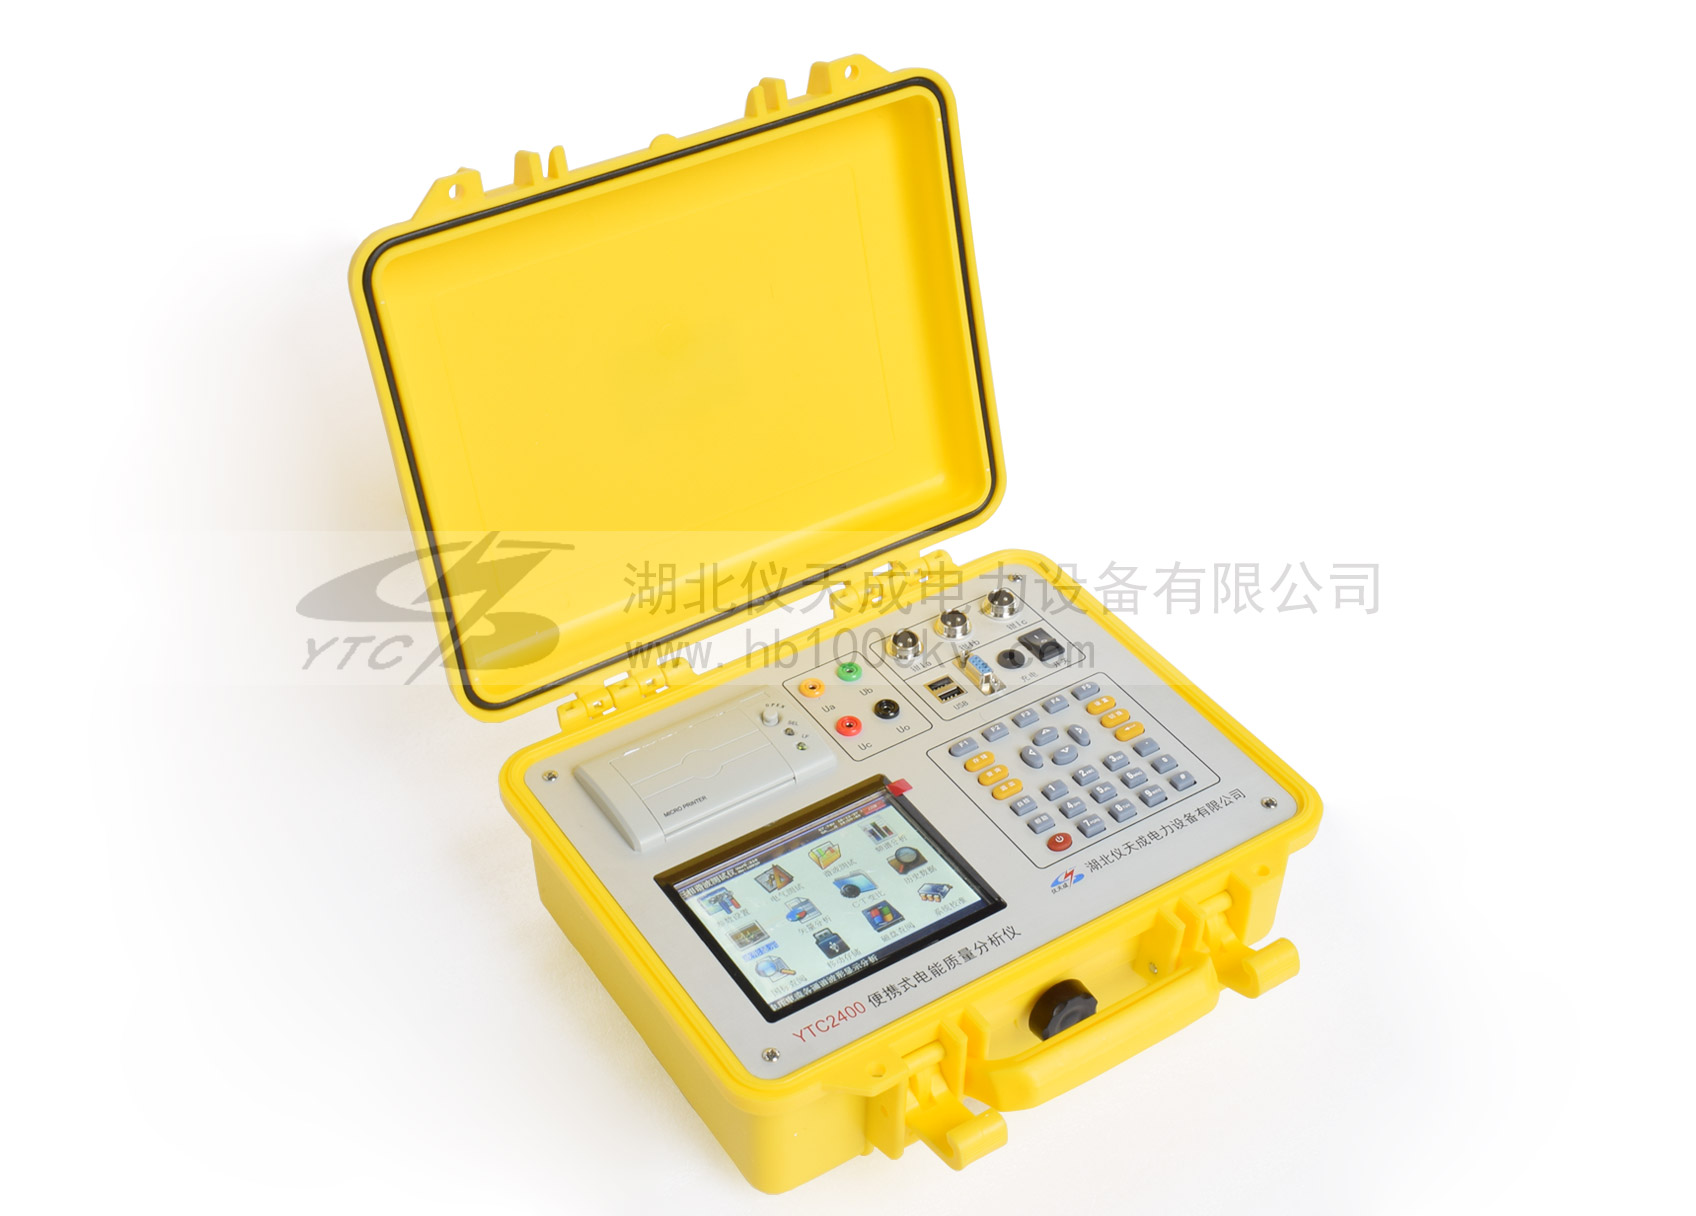 YTC2400便携式电能质量分析仪